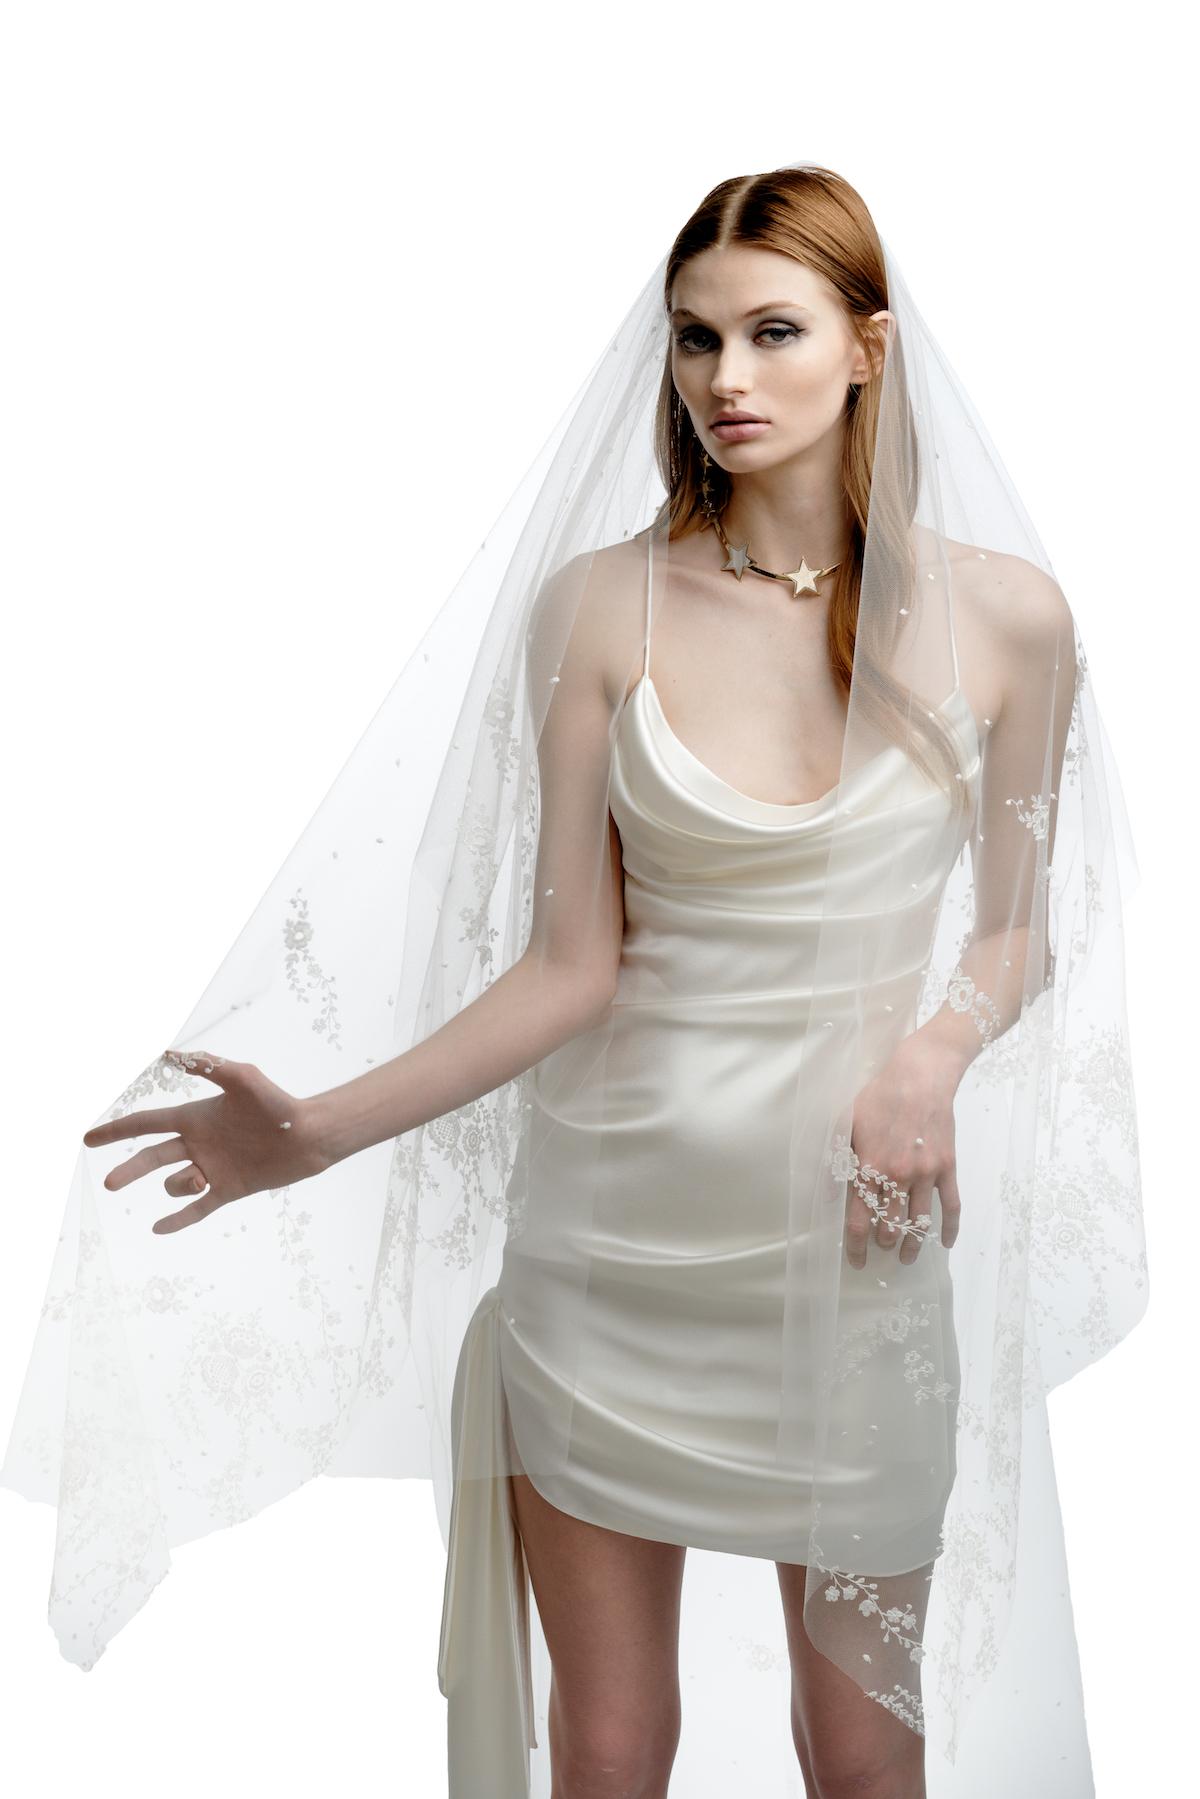 Short white satin wedding dress with cowl neck